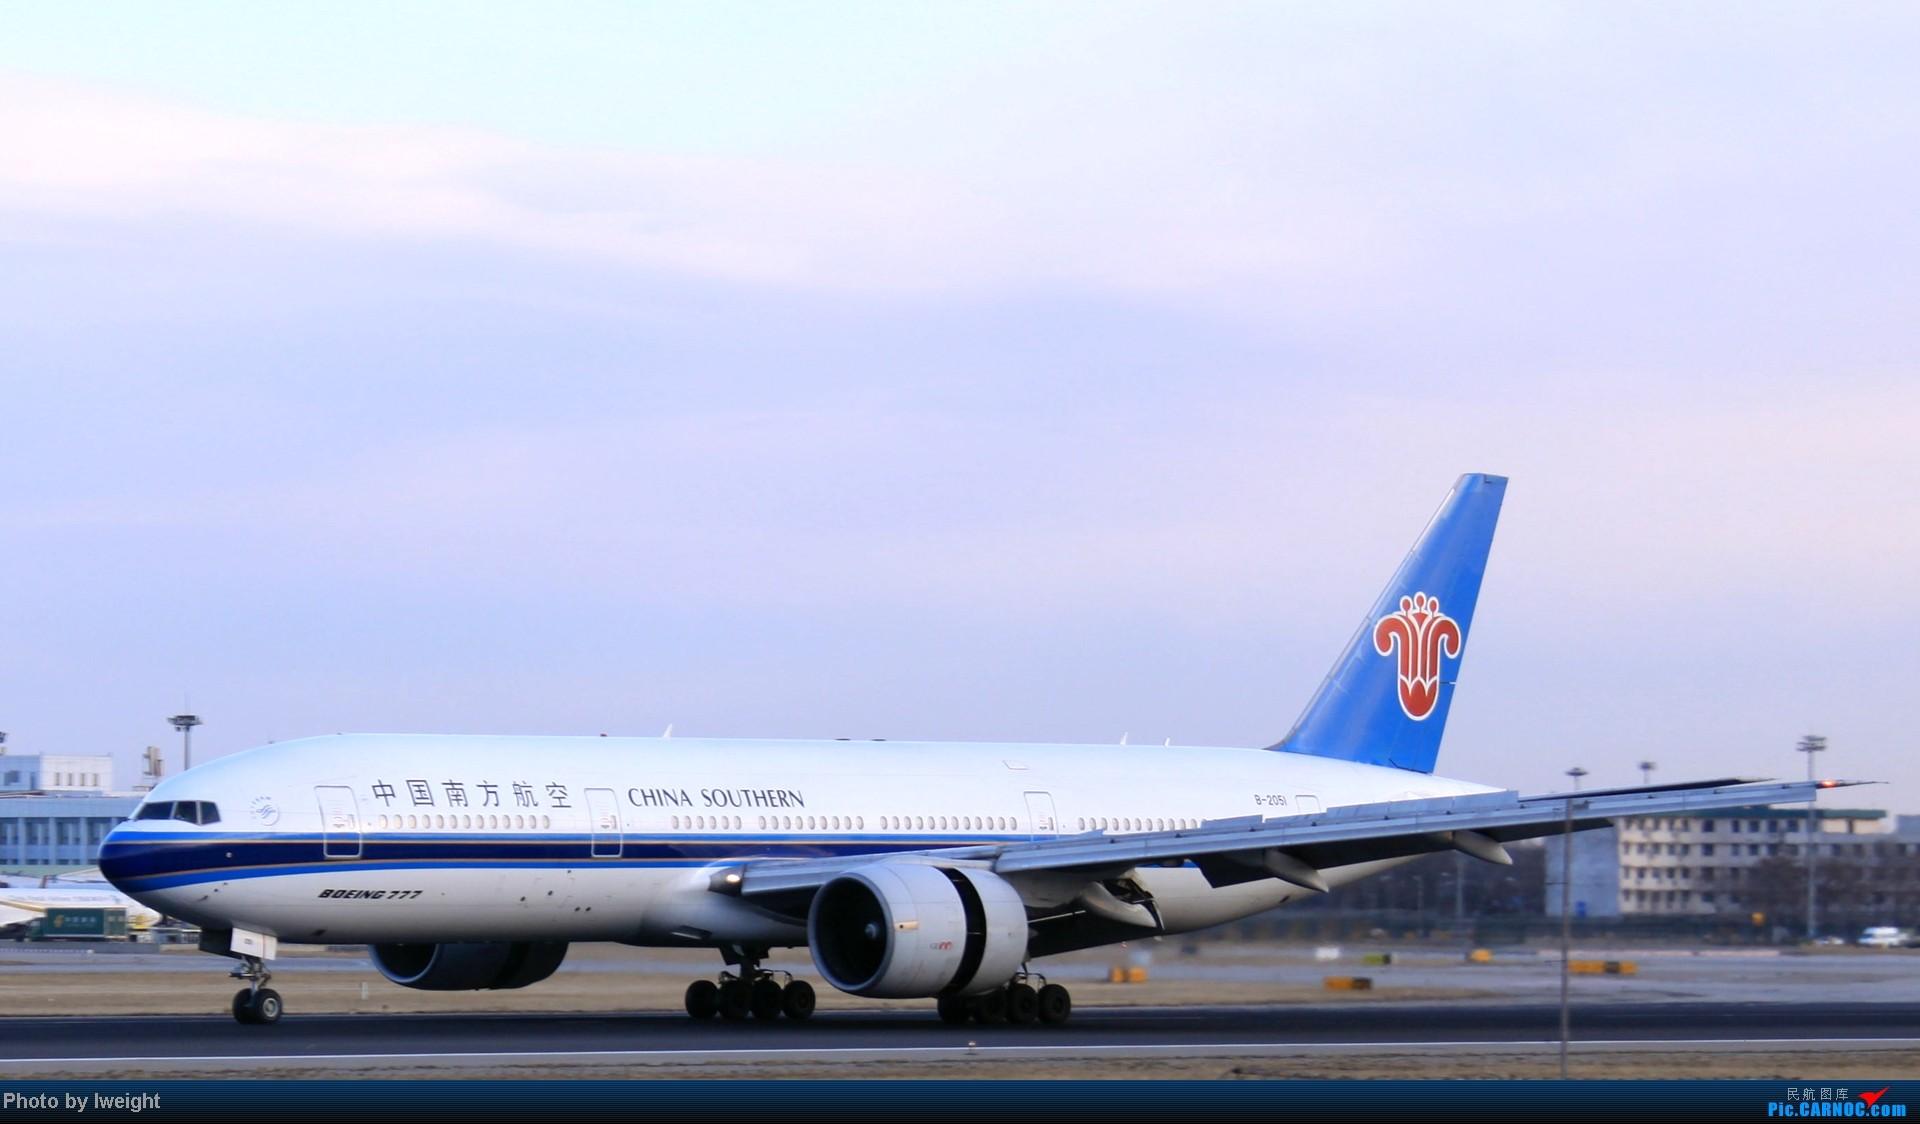 Re:[原创]今天下午瞎拍两个小时的杂图 BOEING 777-200 B-2051 中国北京首都机场